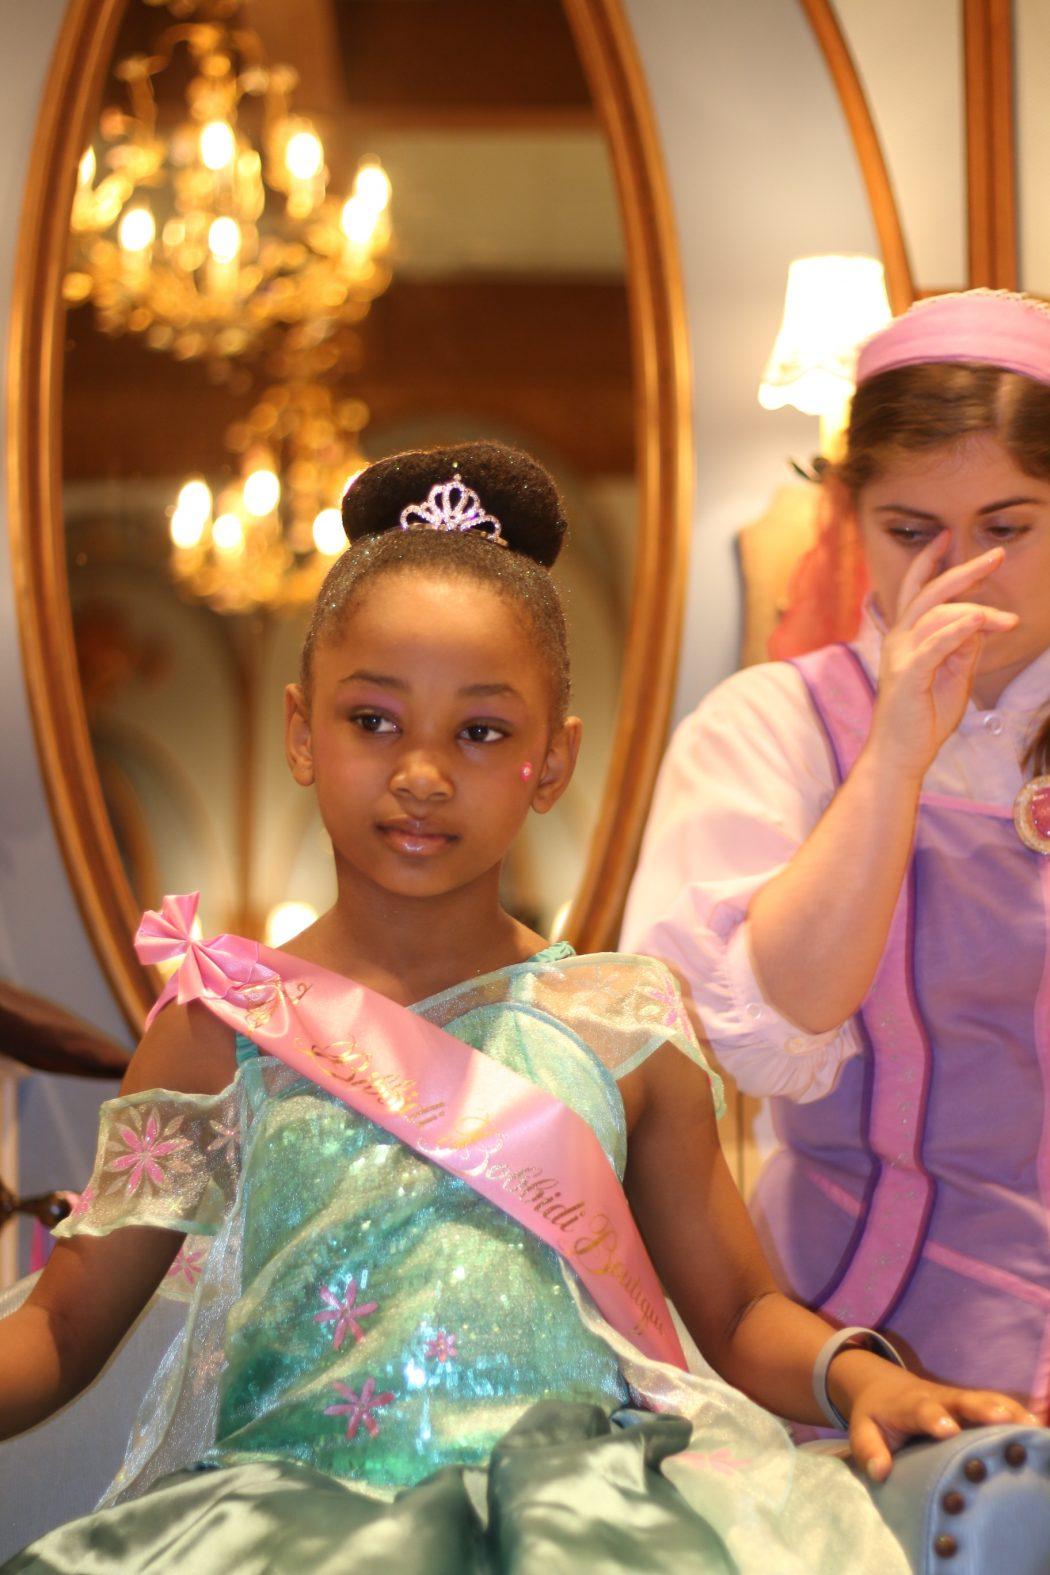 Princess Makeover at Disney Bibbidi Bobbidi Boutique